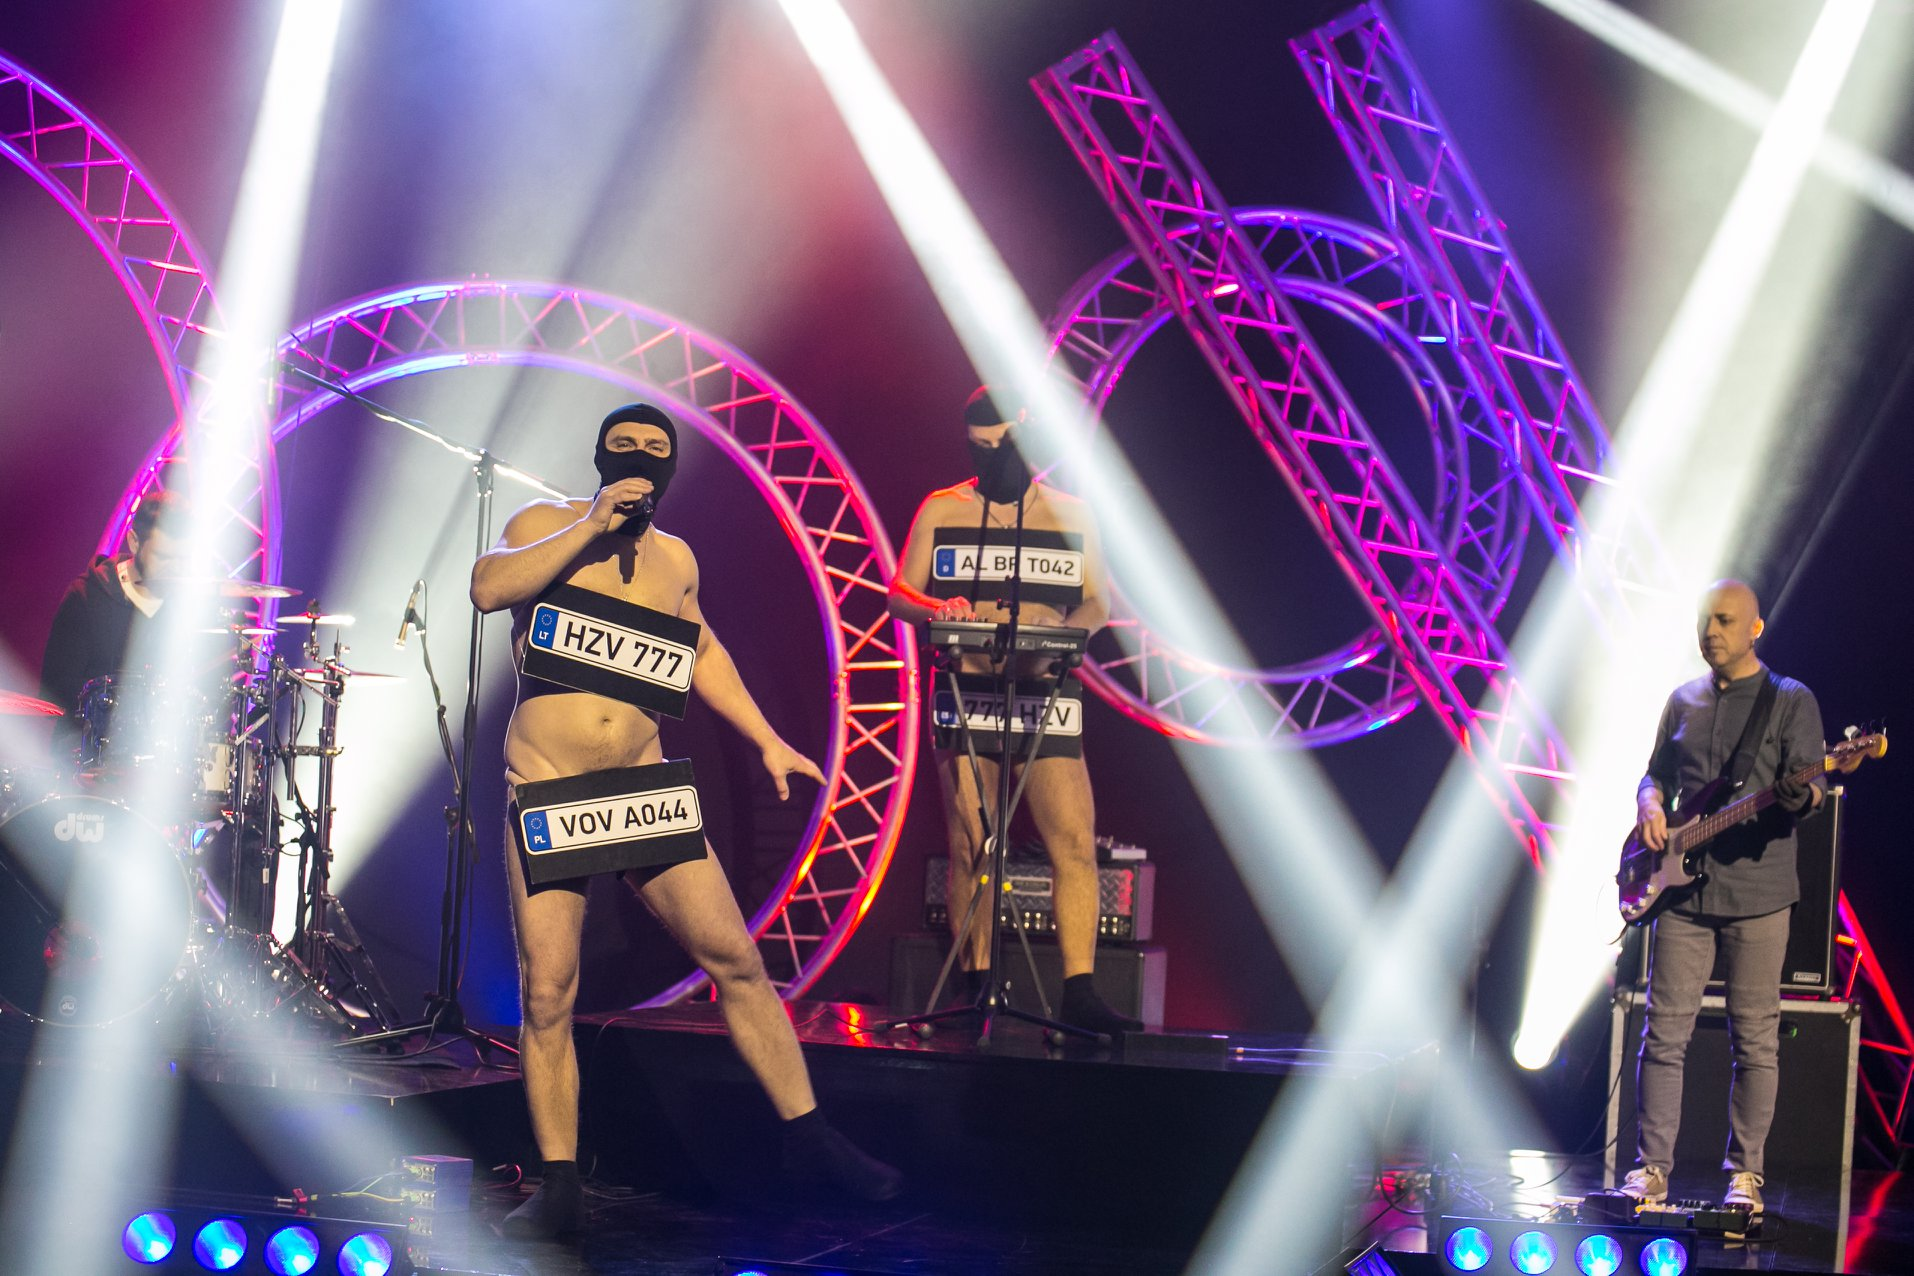 Хамерман Знищує Віруси   ХЗВ Live Band в Києві  придбати квитки на ... 7347522fa0a2f